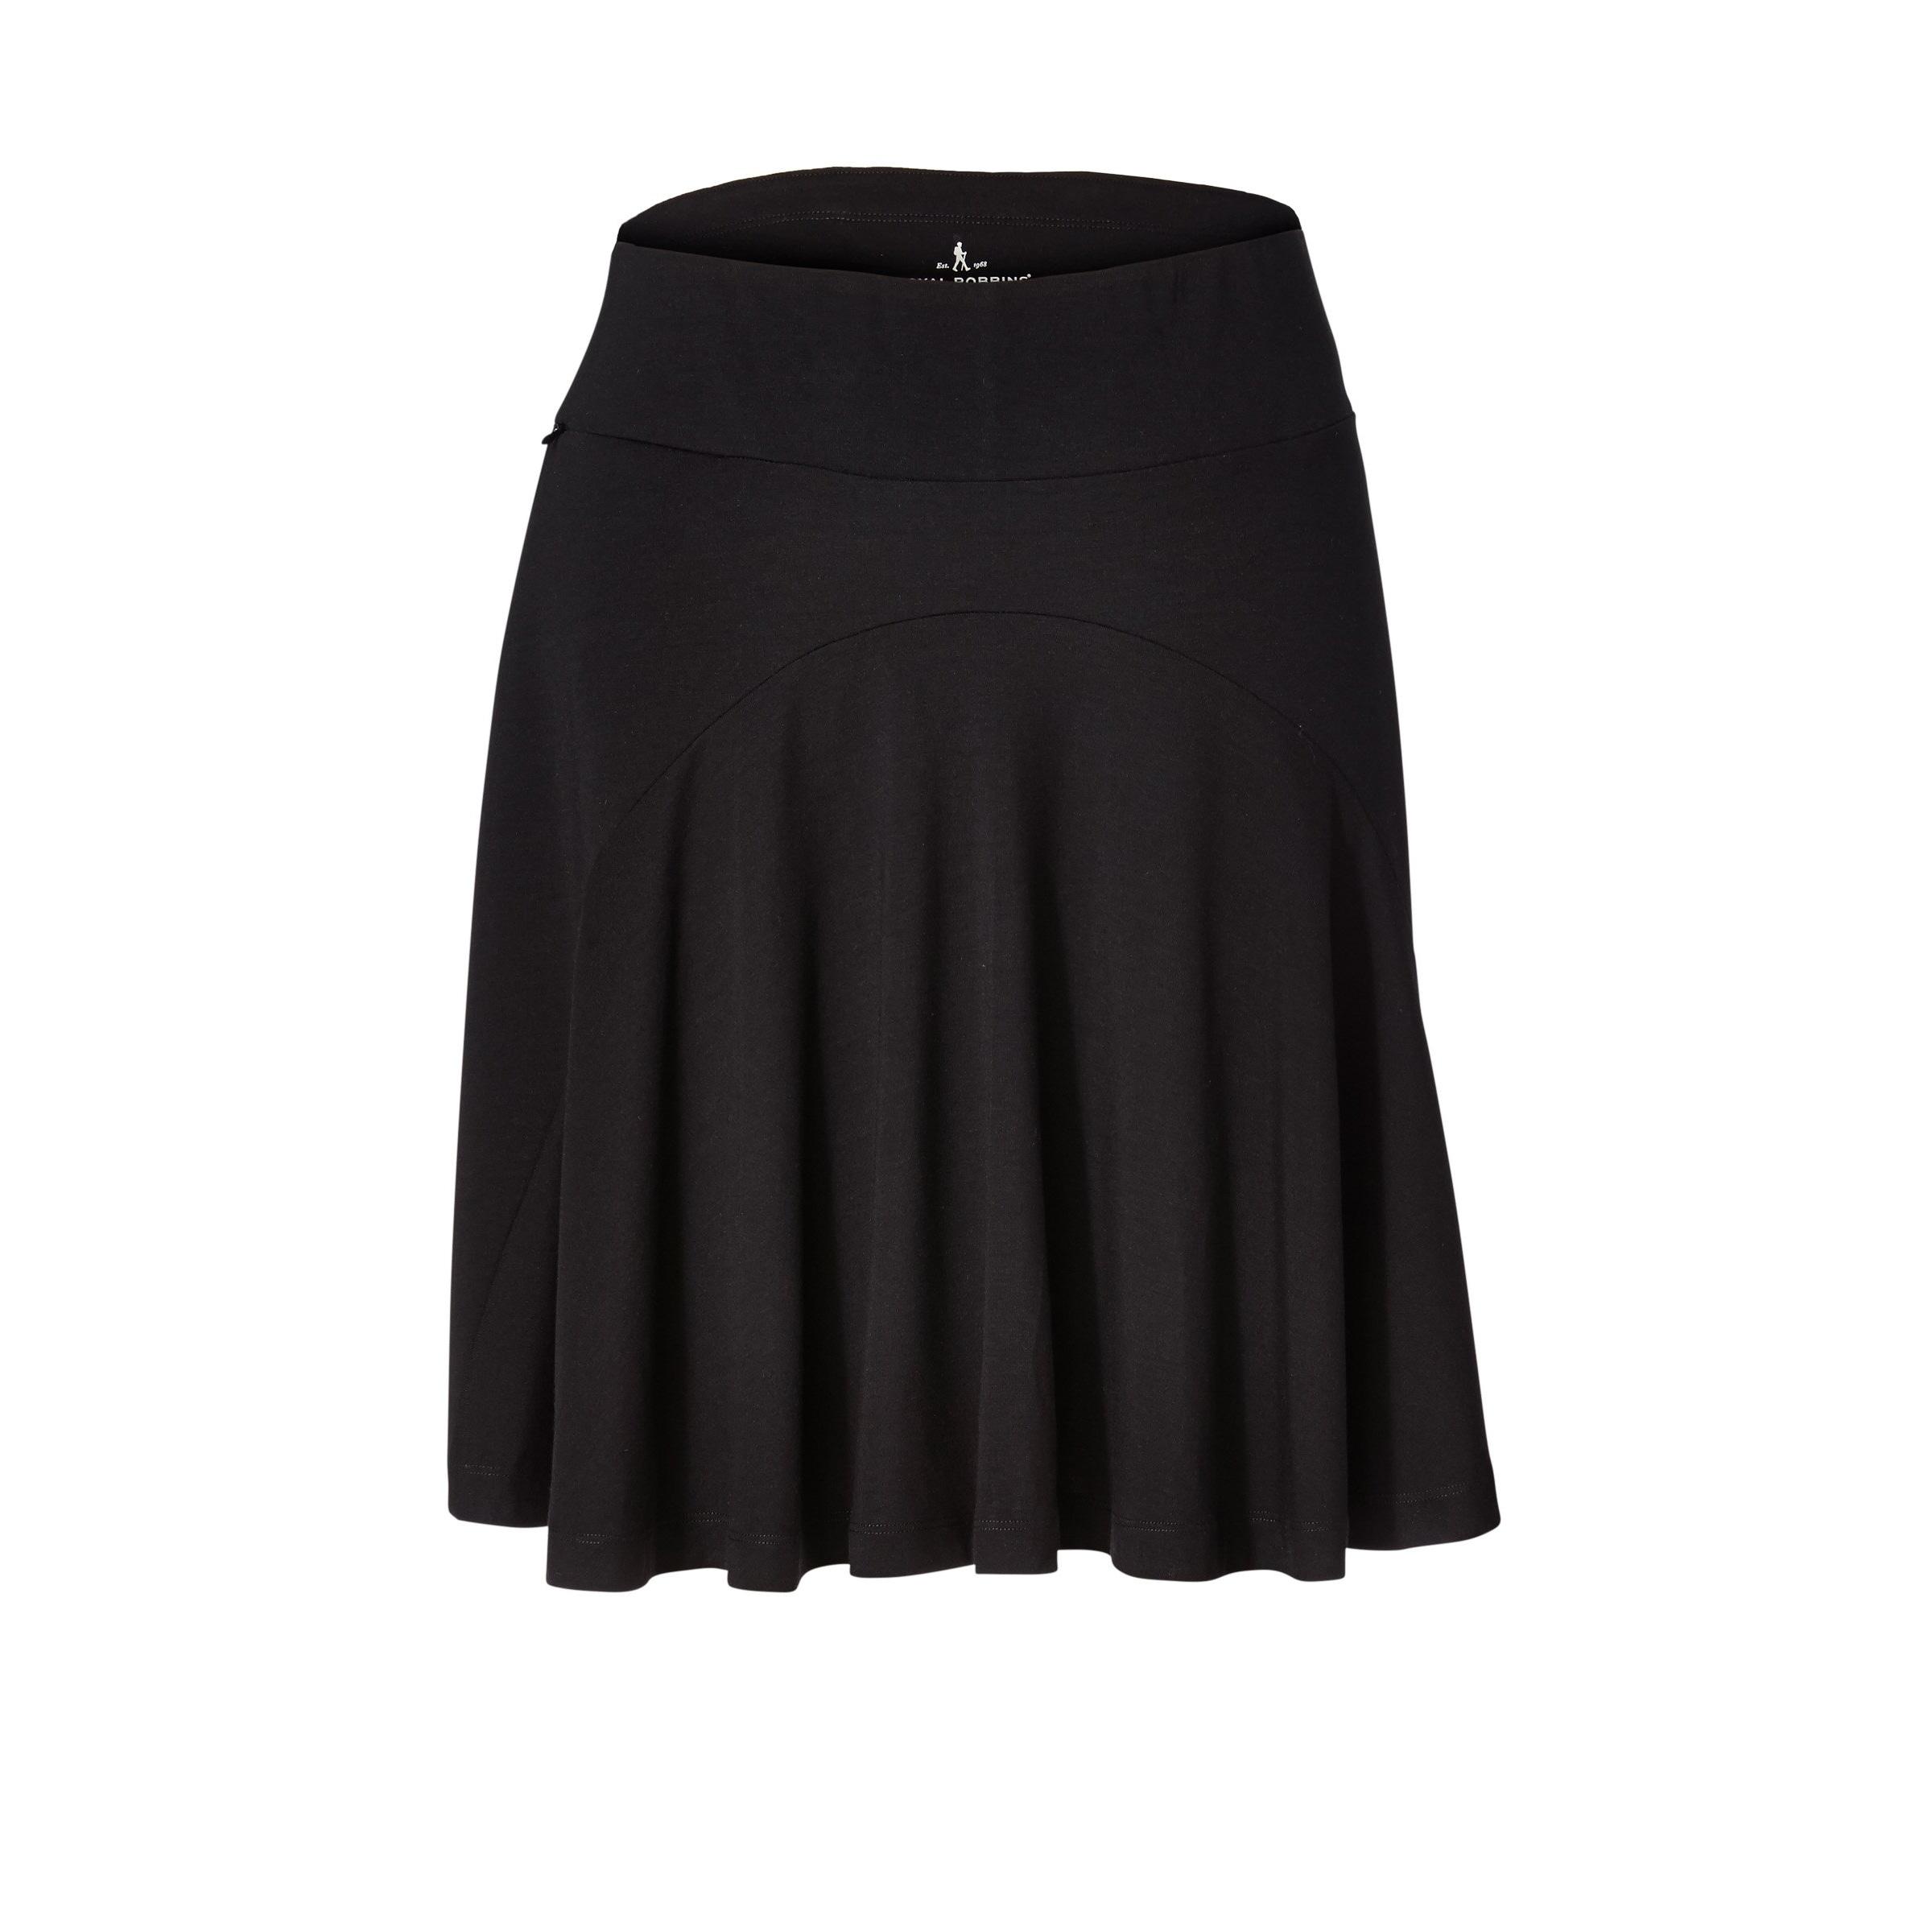 Essential Tencel Skirt - Women's